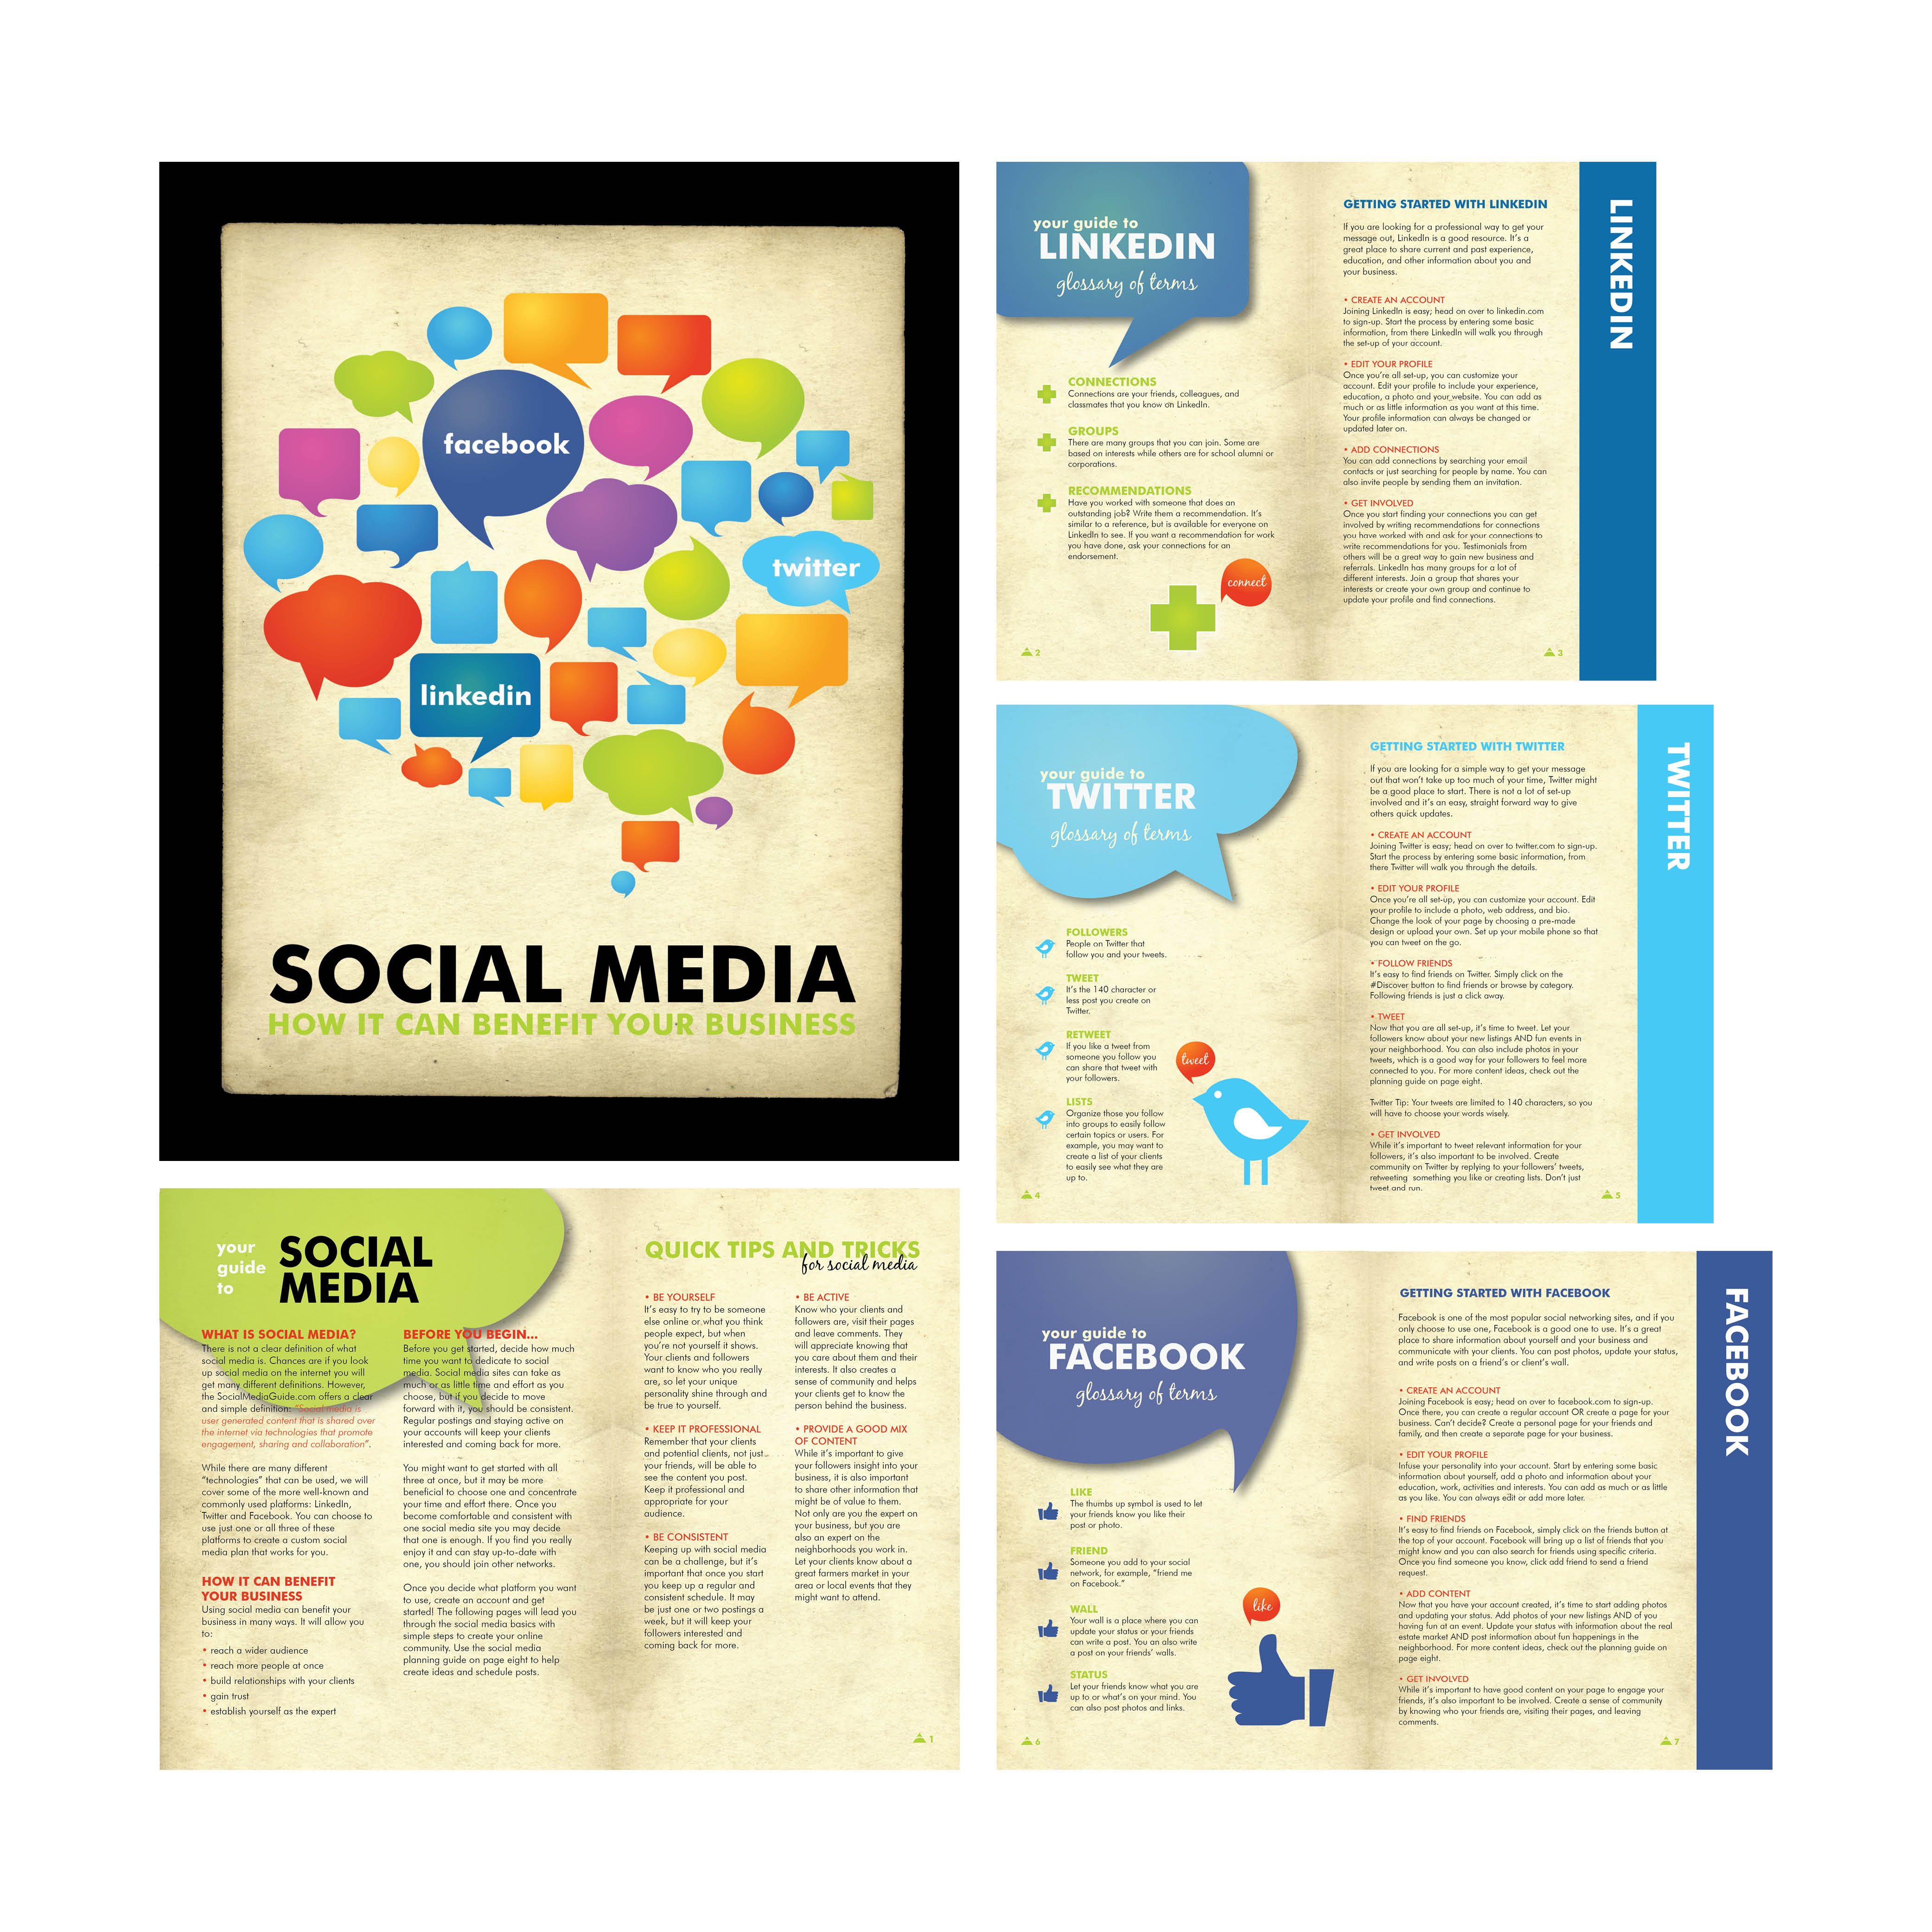 SOCIAL MEDIA BOOKLET